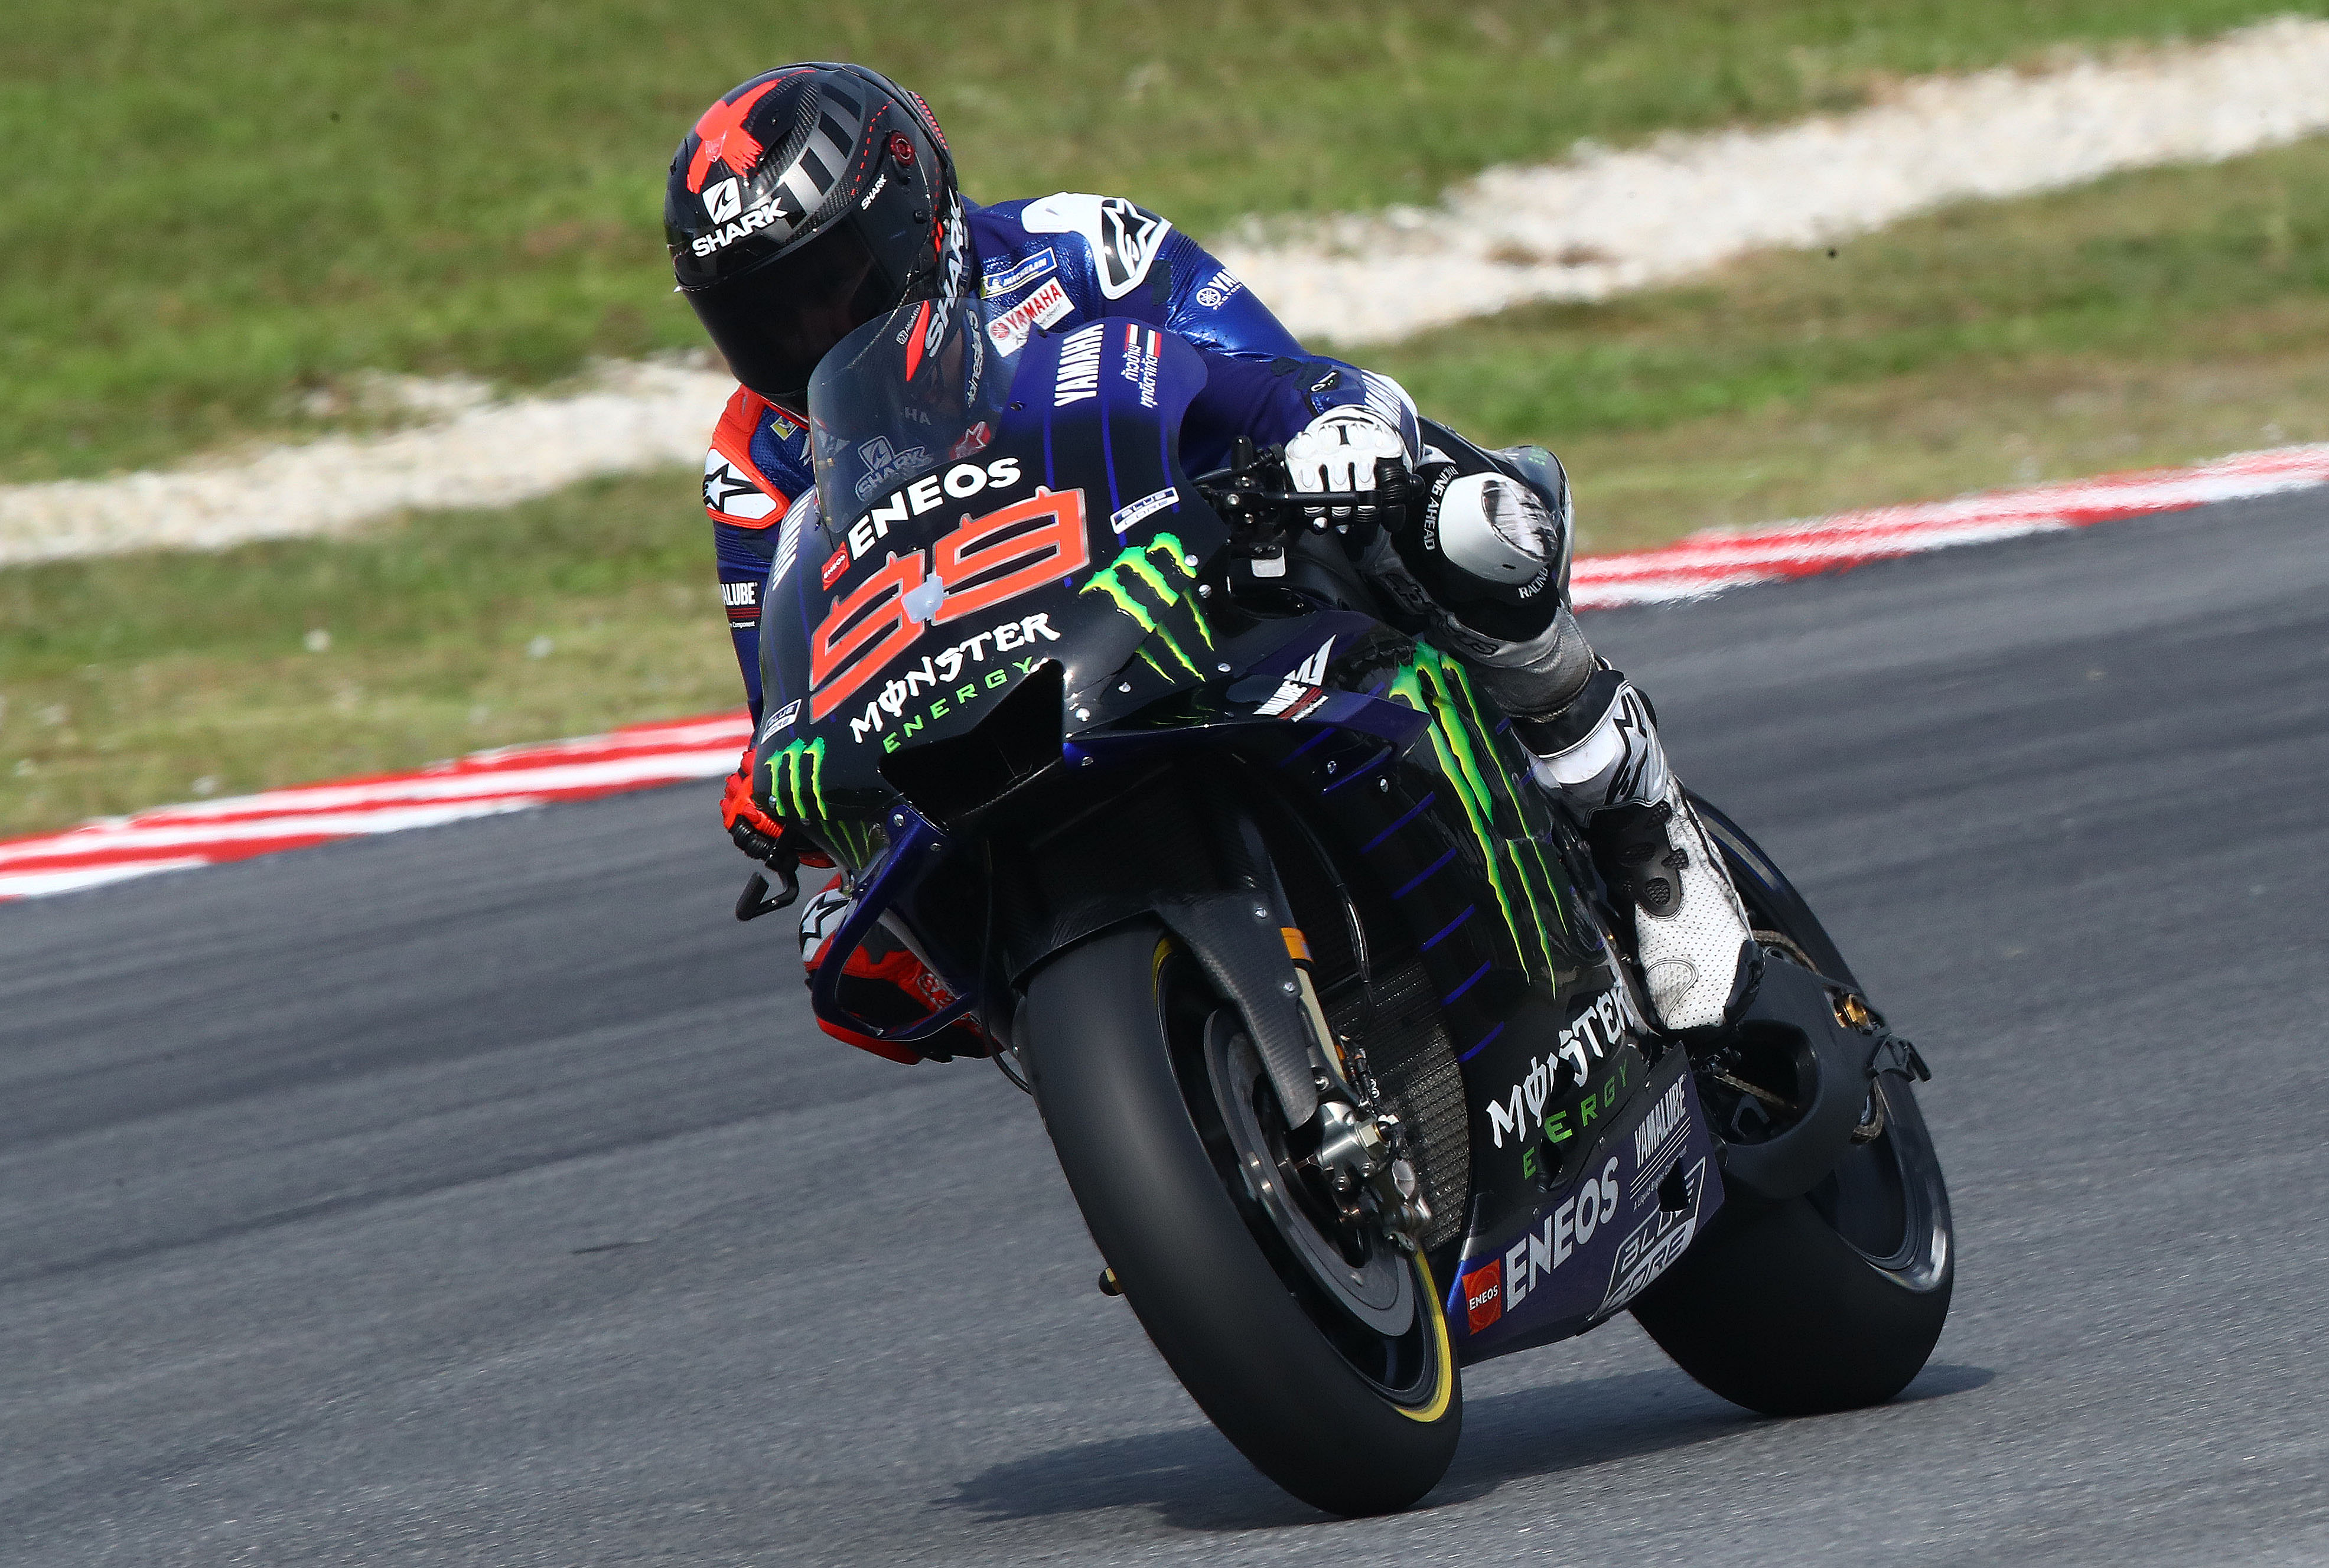 Jorge Lorenzo wildcard MotoGP 2020